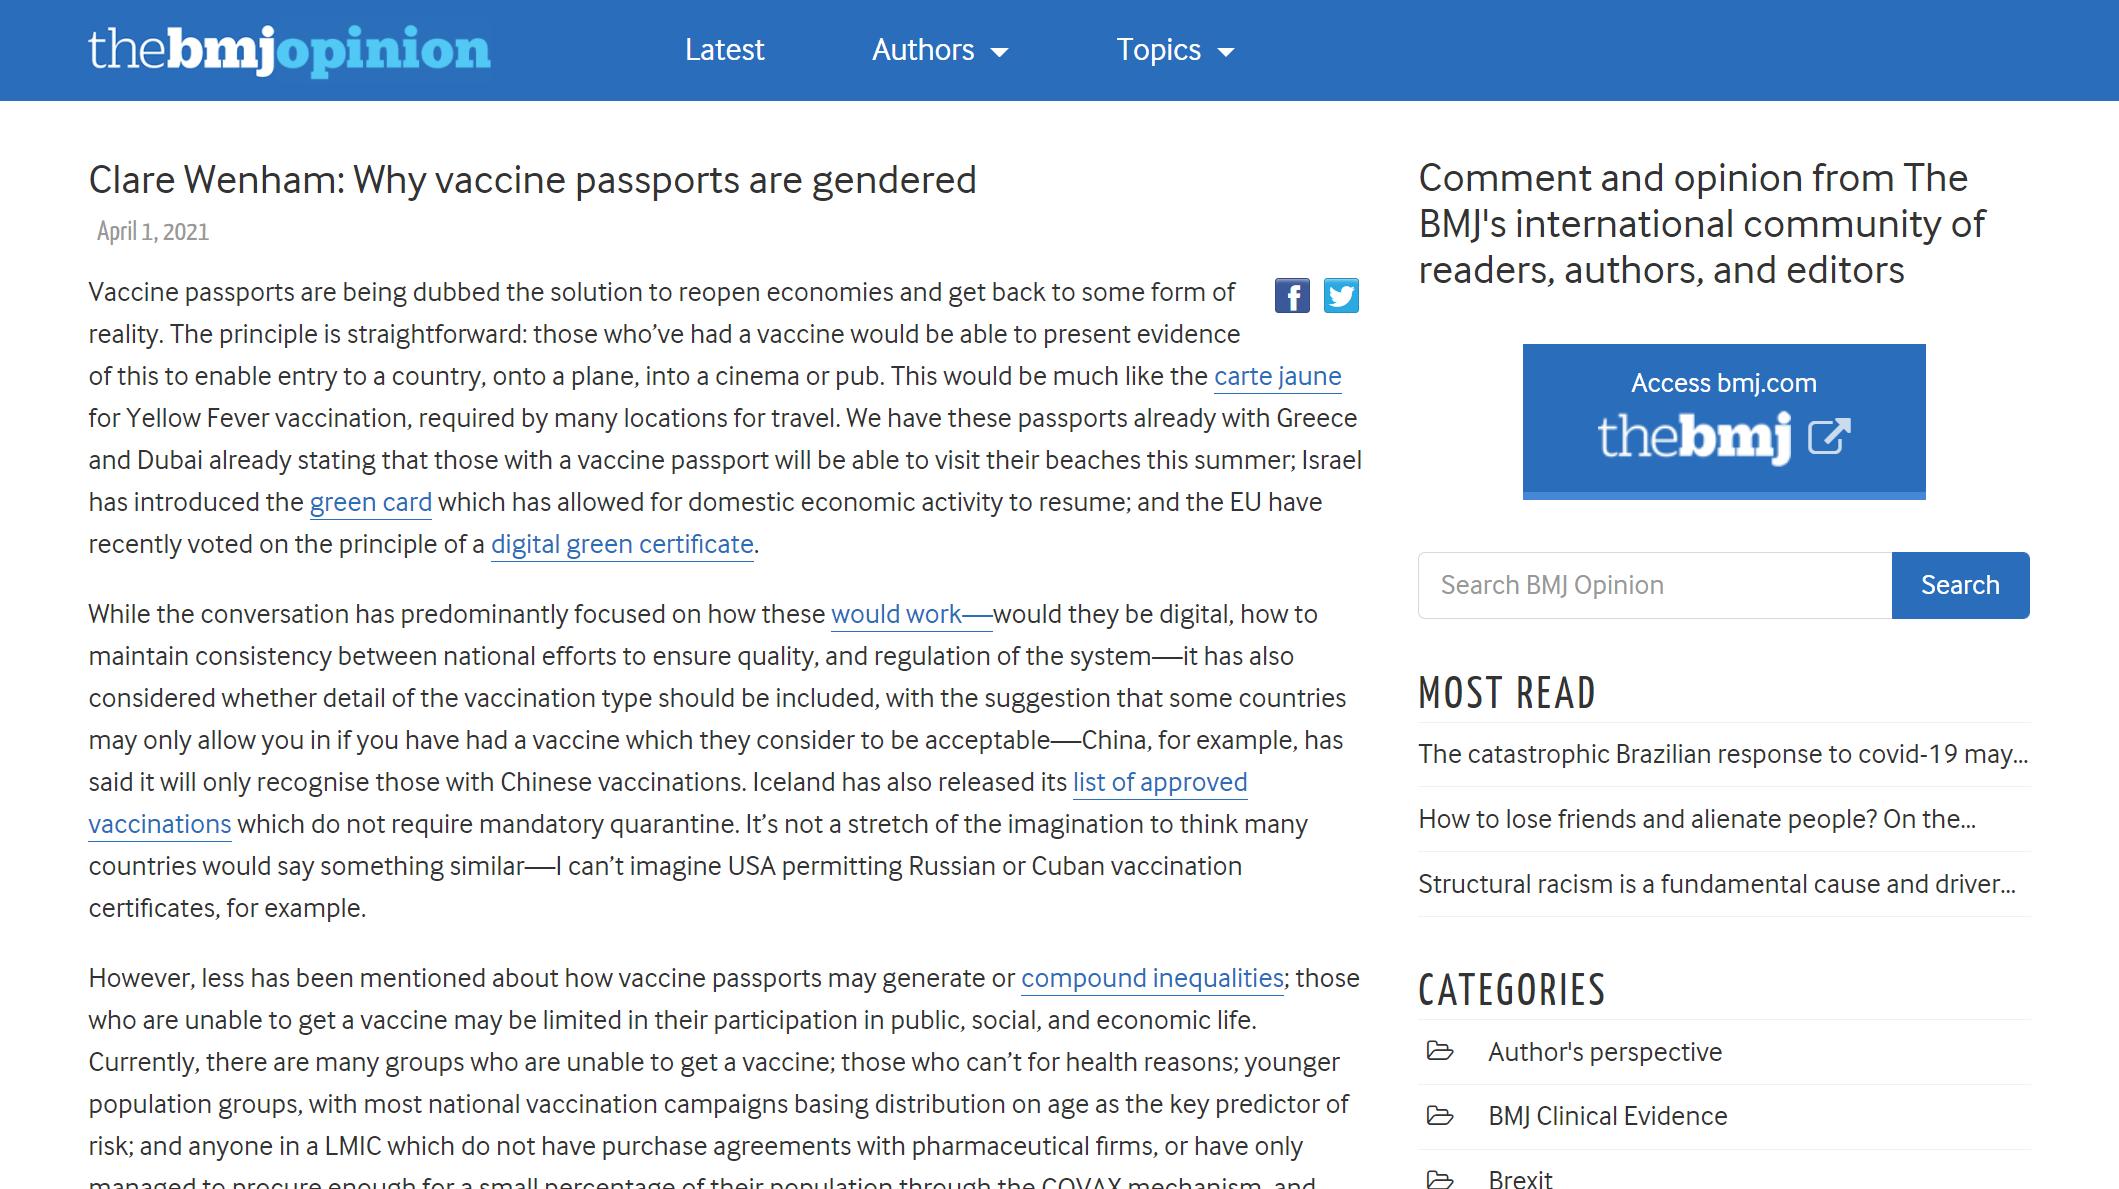 Why vaccine passports are gendered